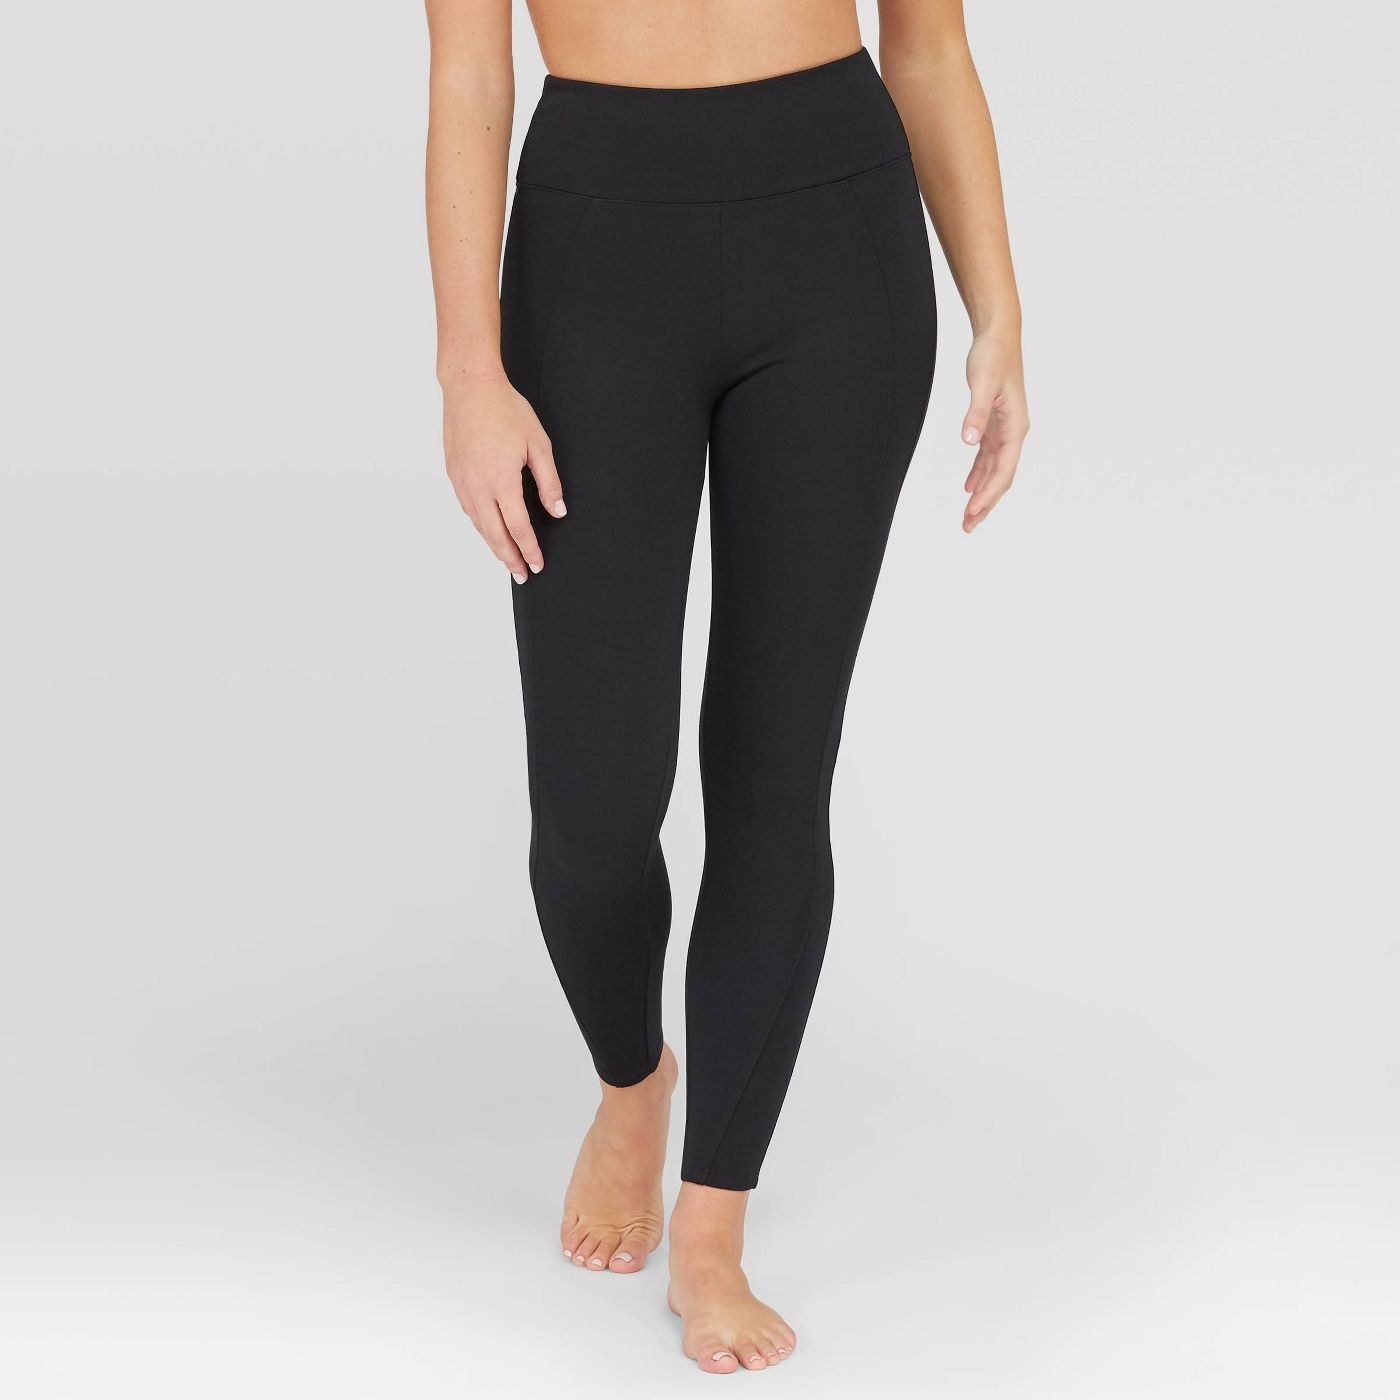 Model in black shaping leggings